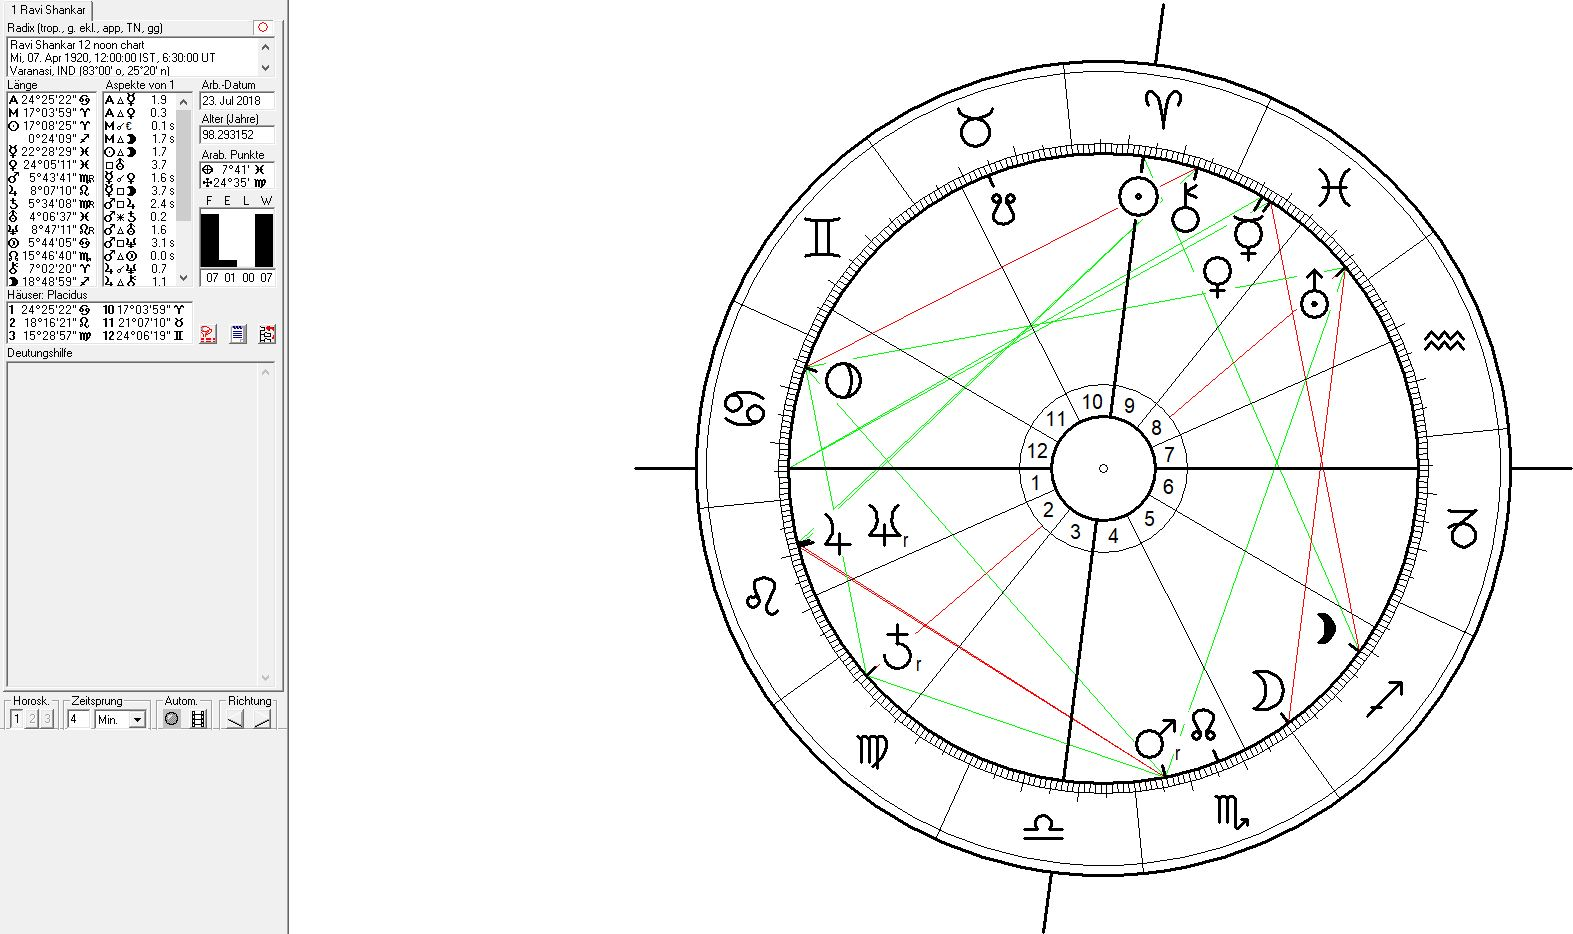 Astrology and Music - Ravi Shankar - spiritual healing through a Neptune-Jupiter conjunction